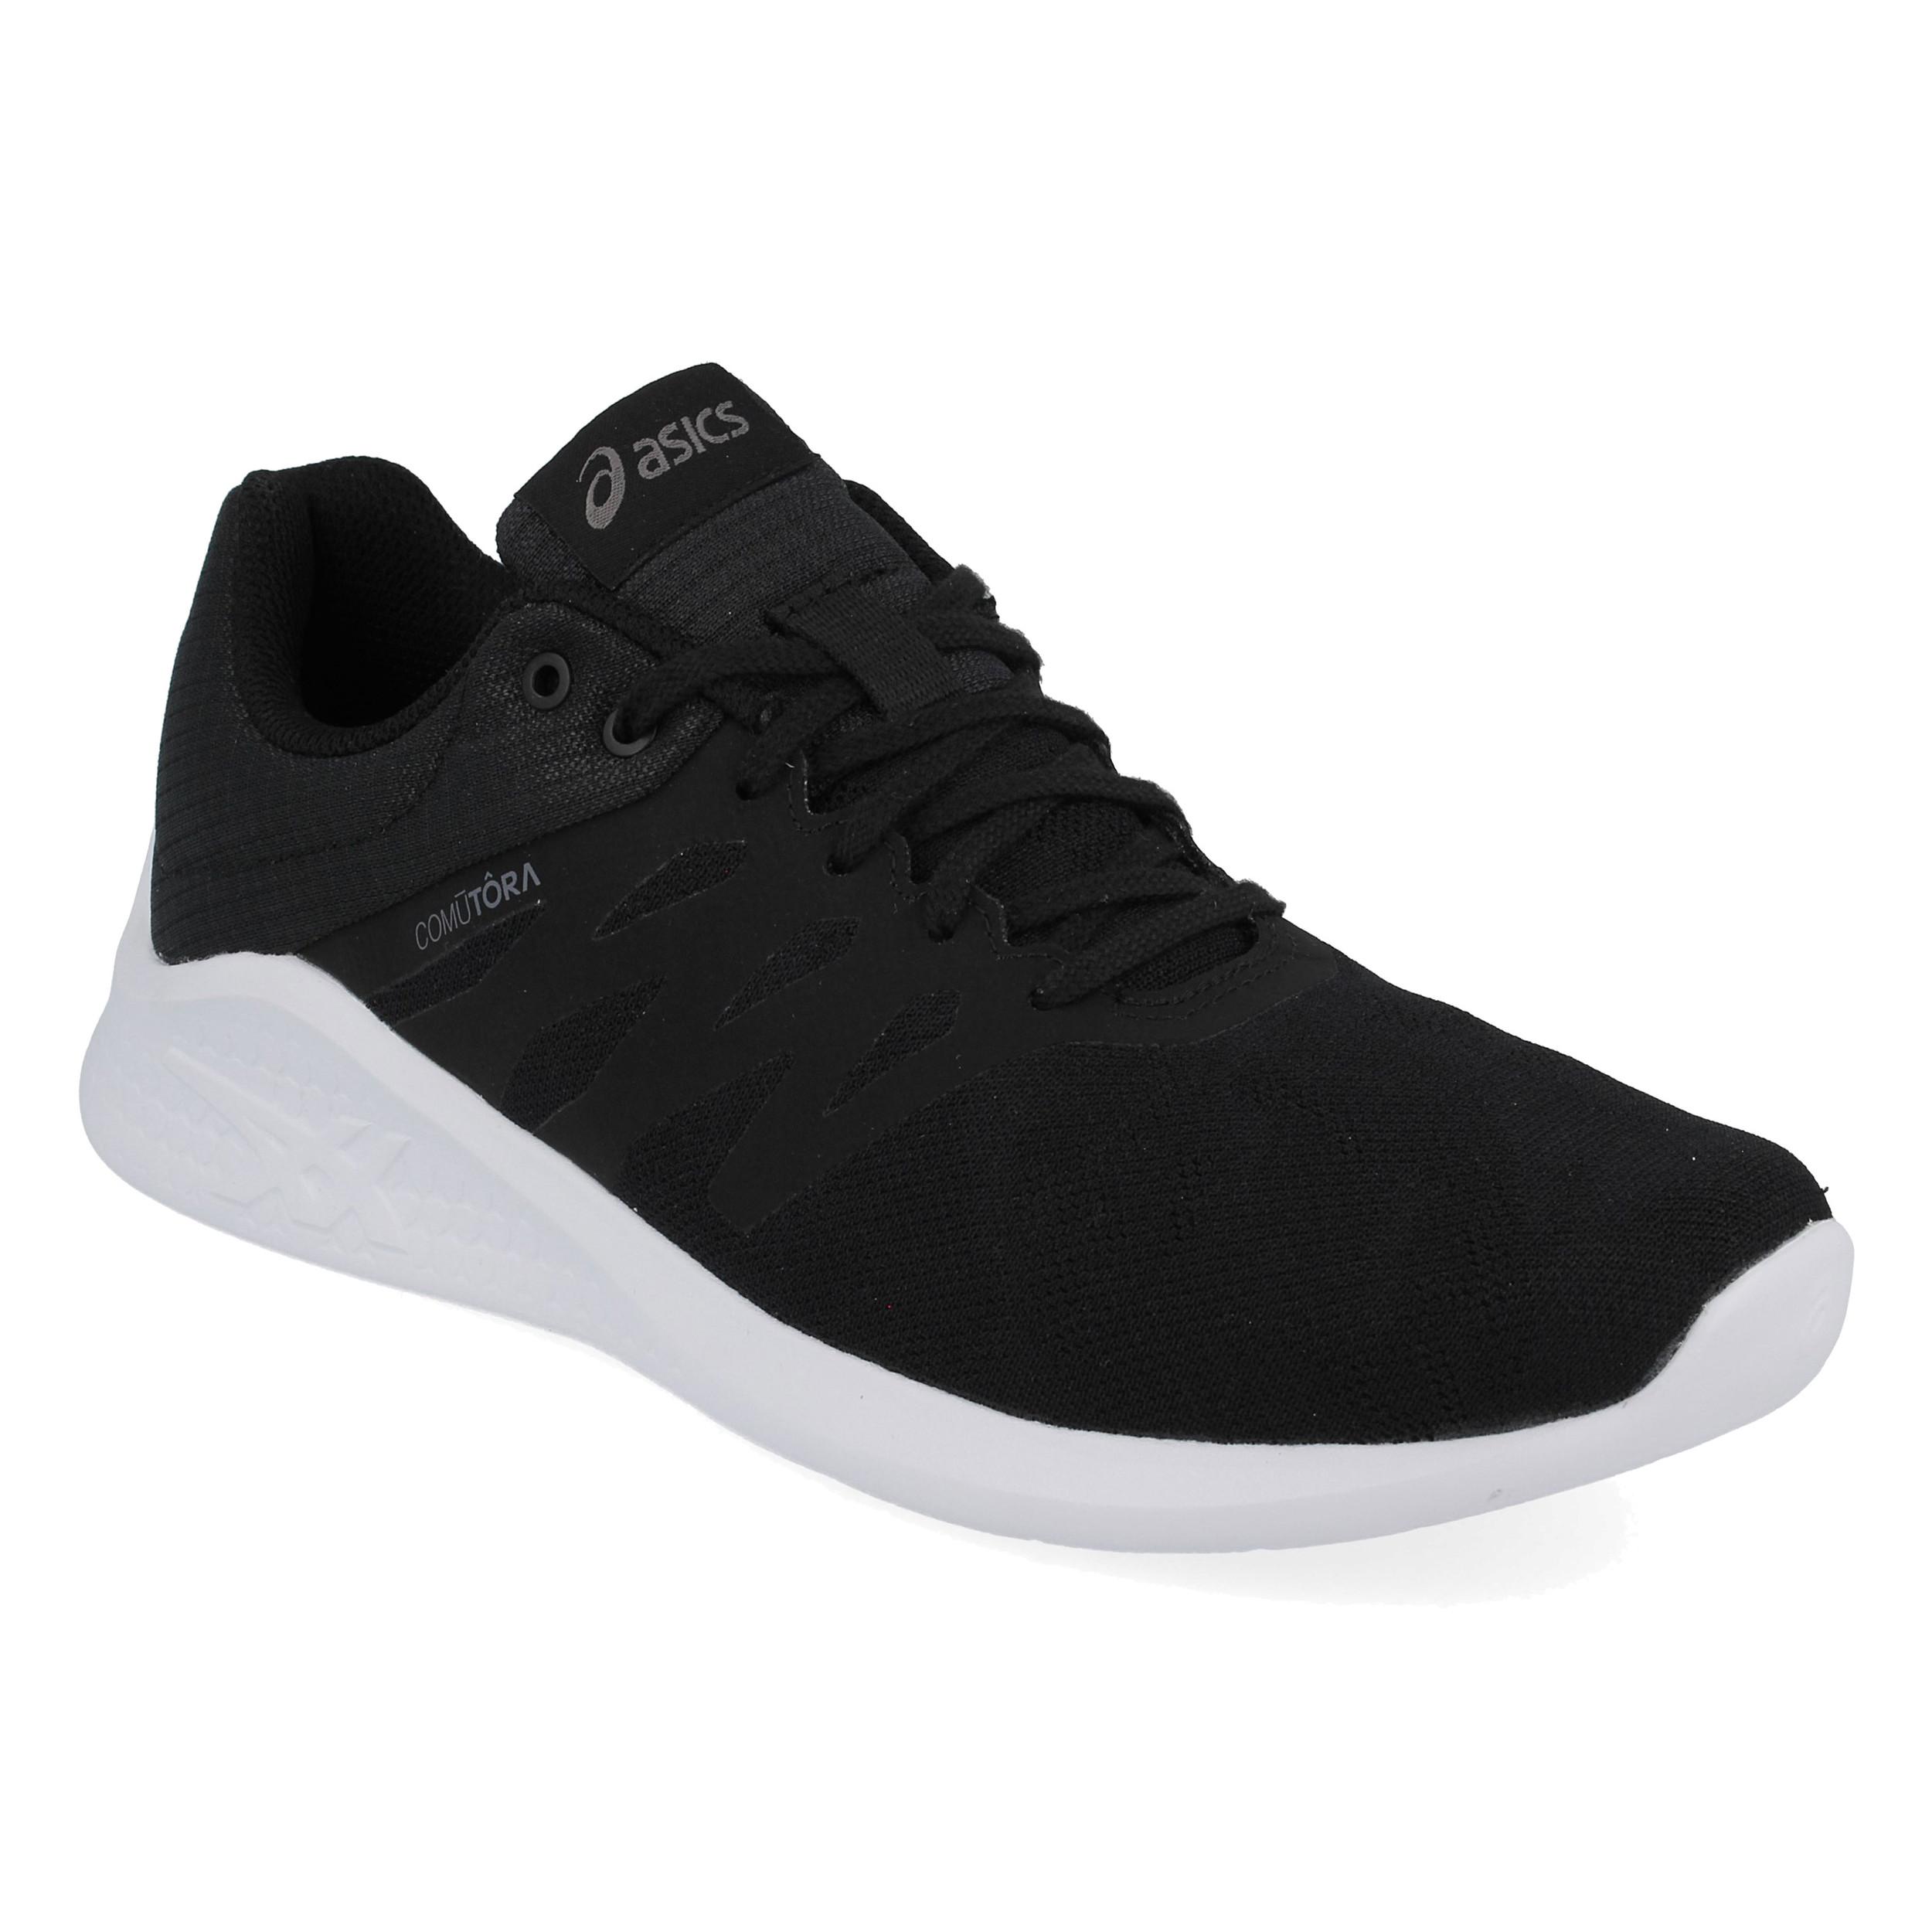 Detalles de Asics Hombre Comutora Mx Correr Zapatos Zapatillas Negro Deporte Gimnasio